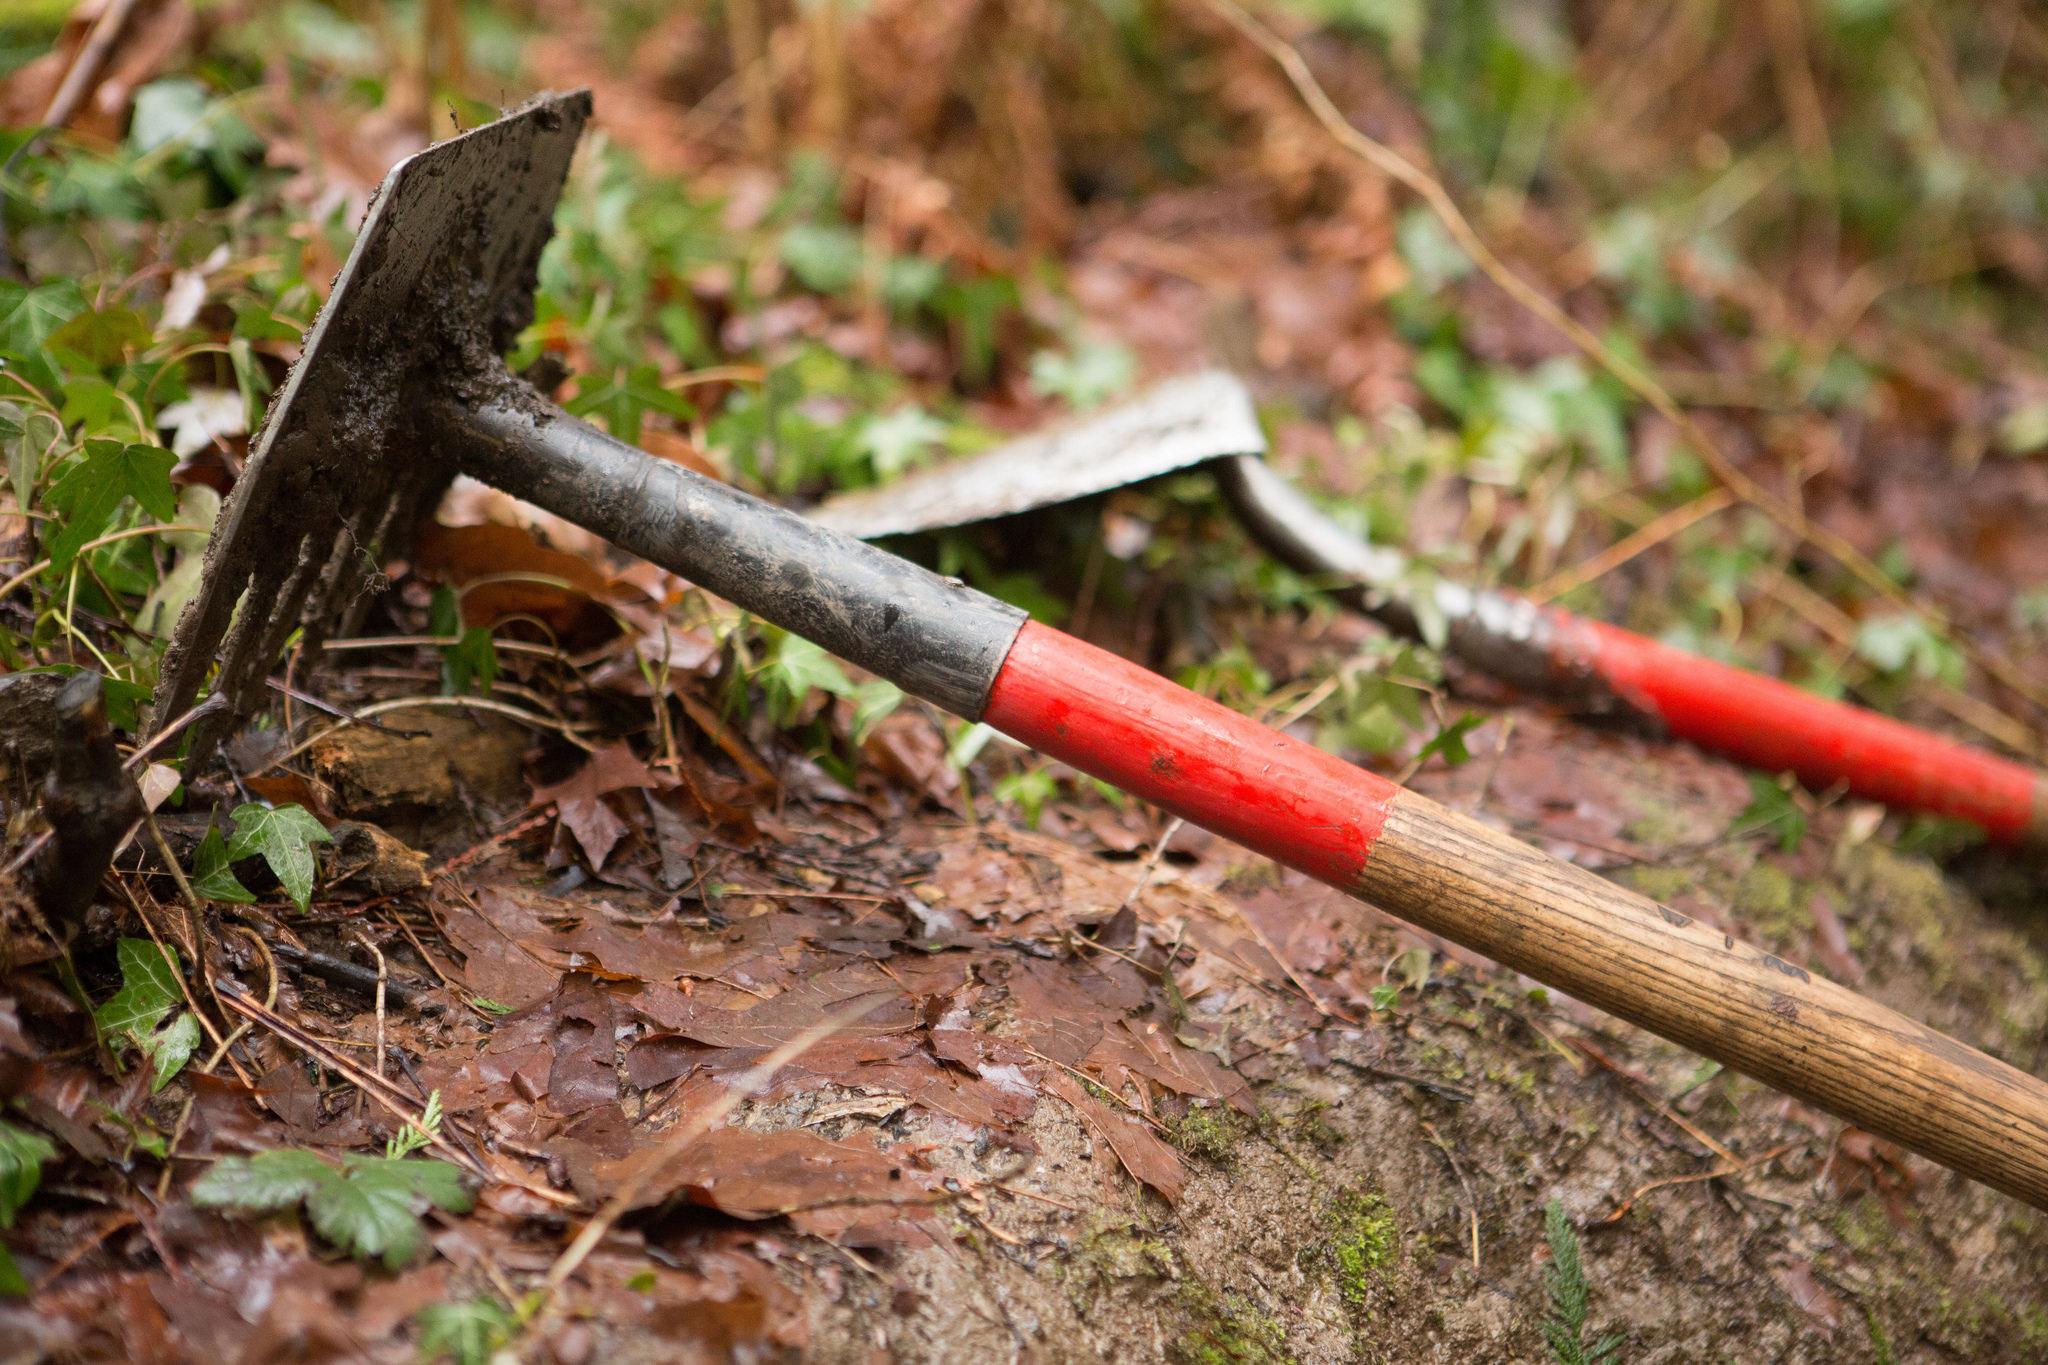 Tools on trail emma cassidy